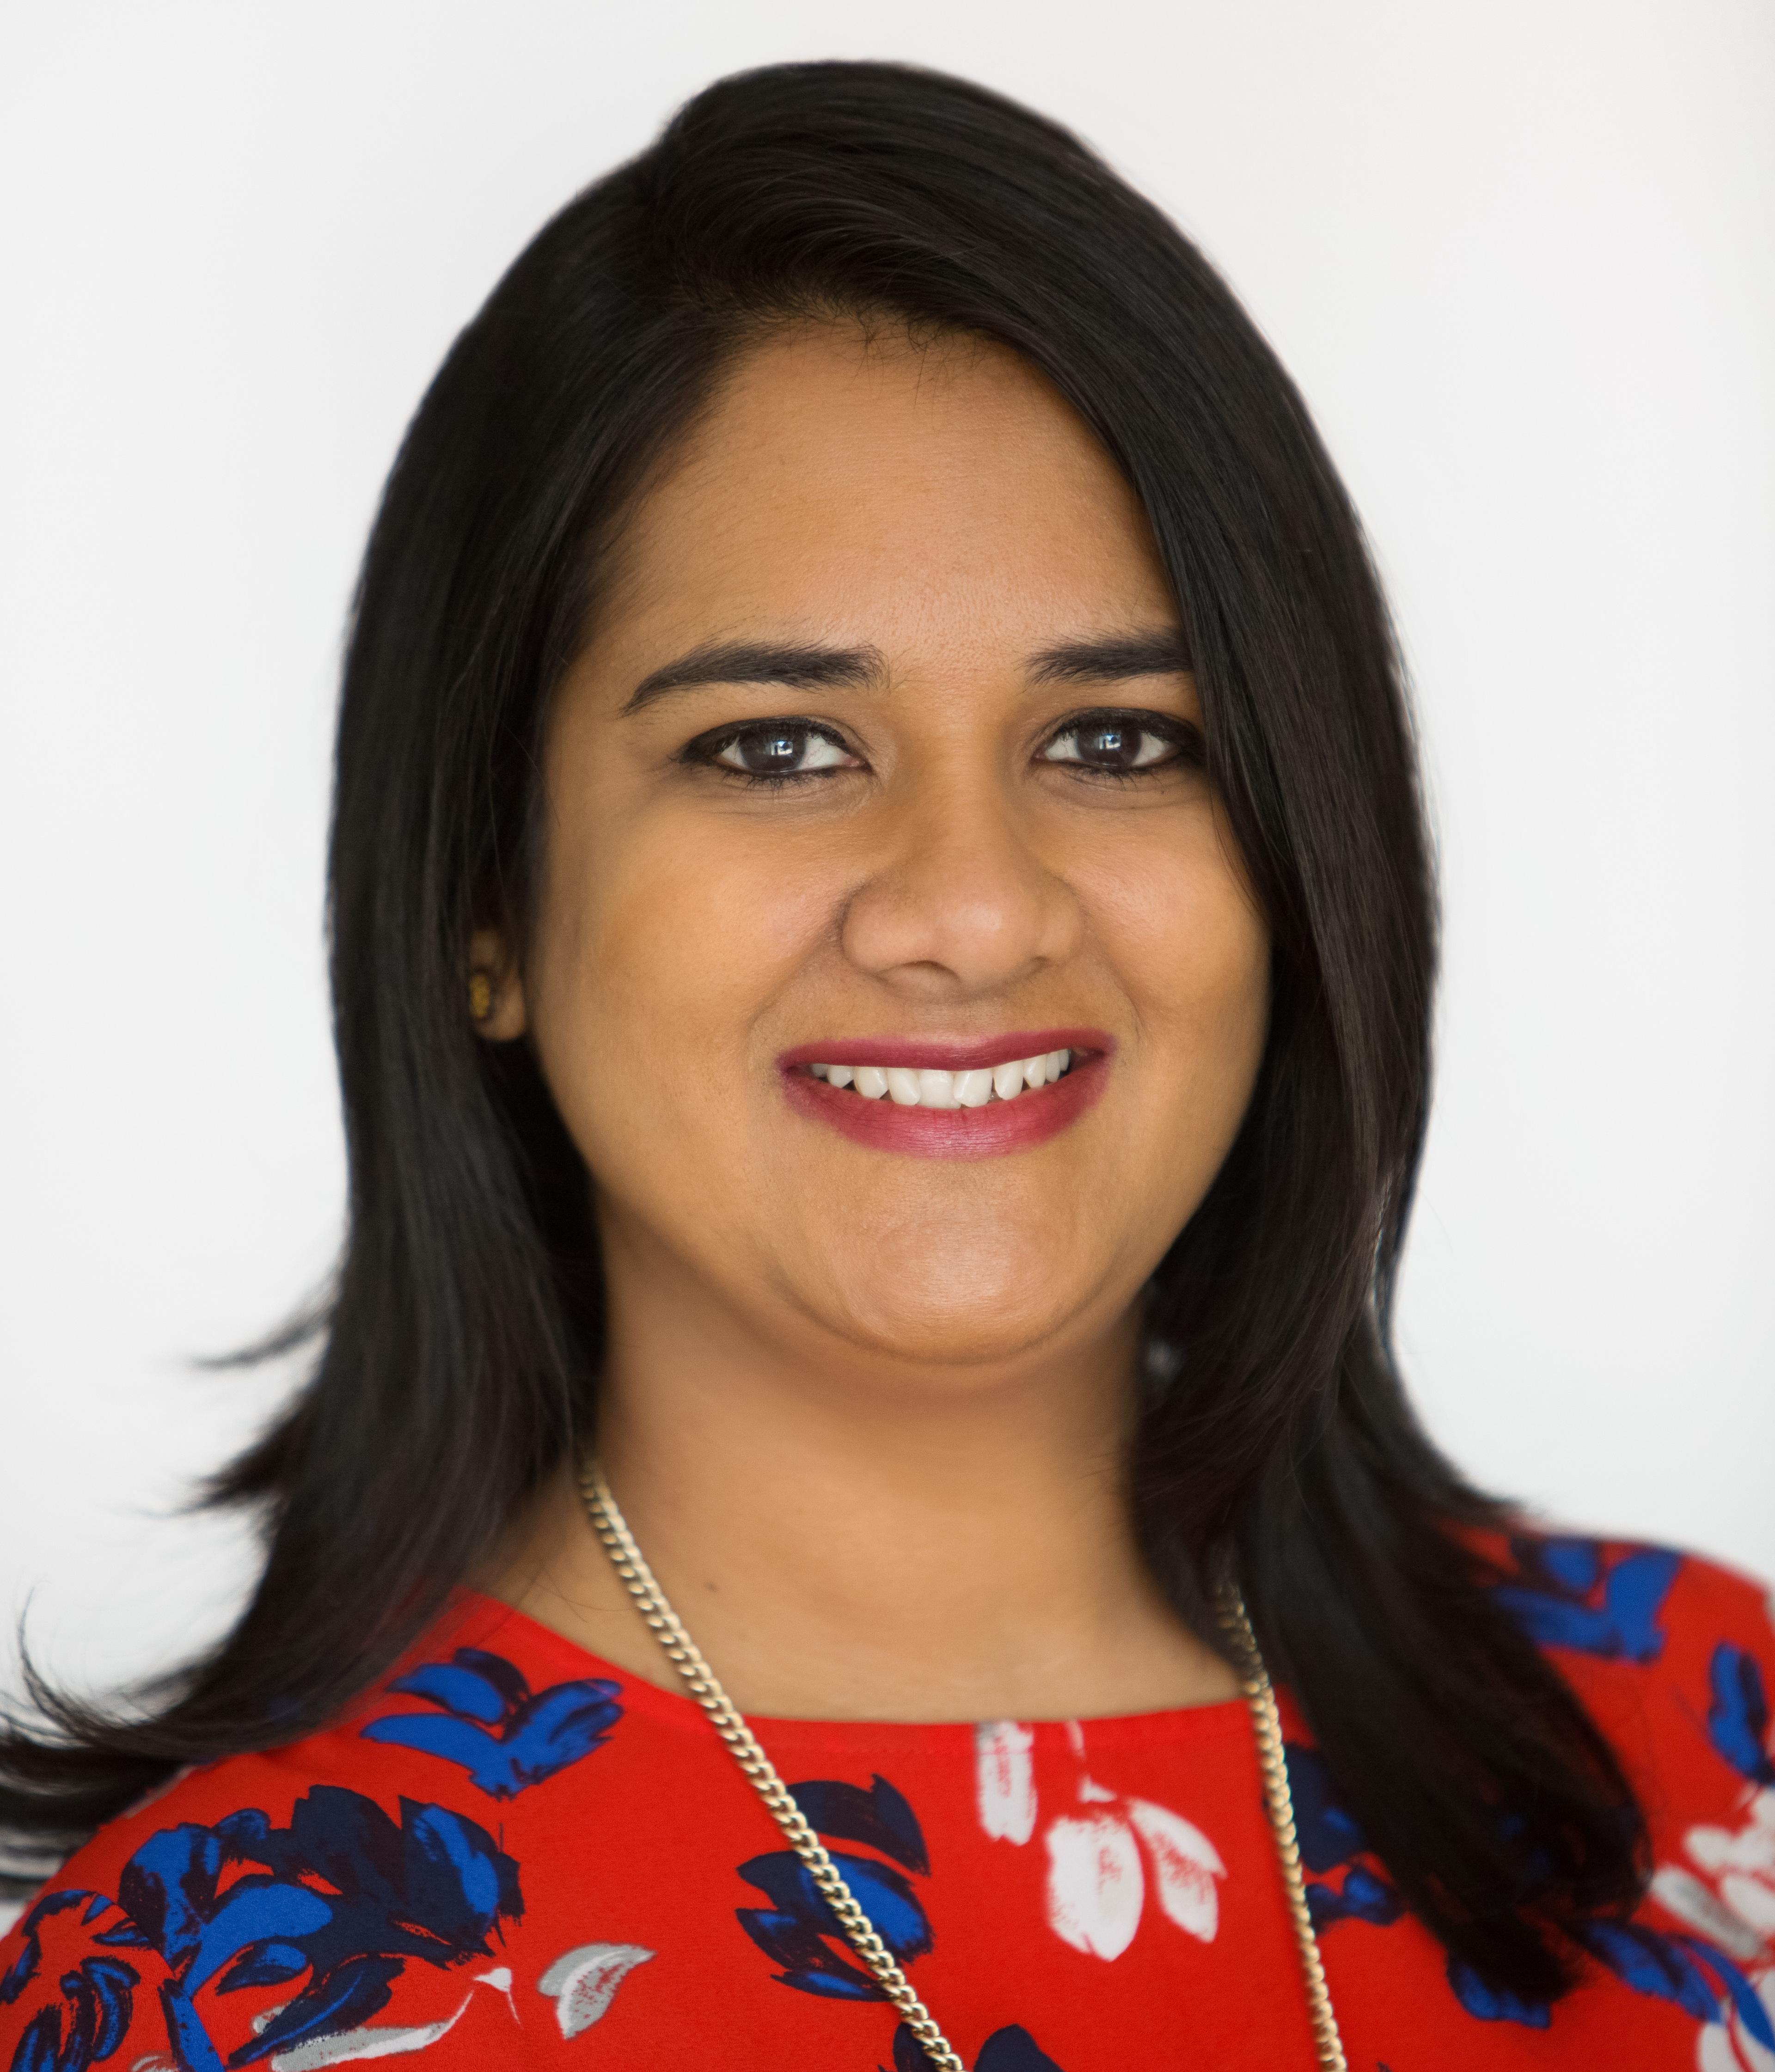 Nandini Kalyanasundaram